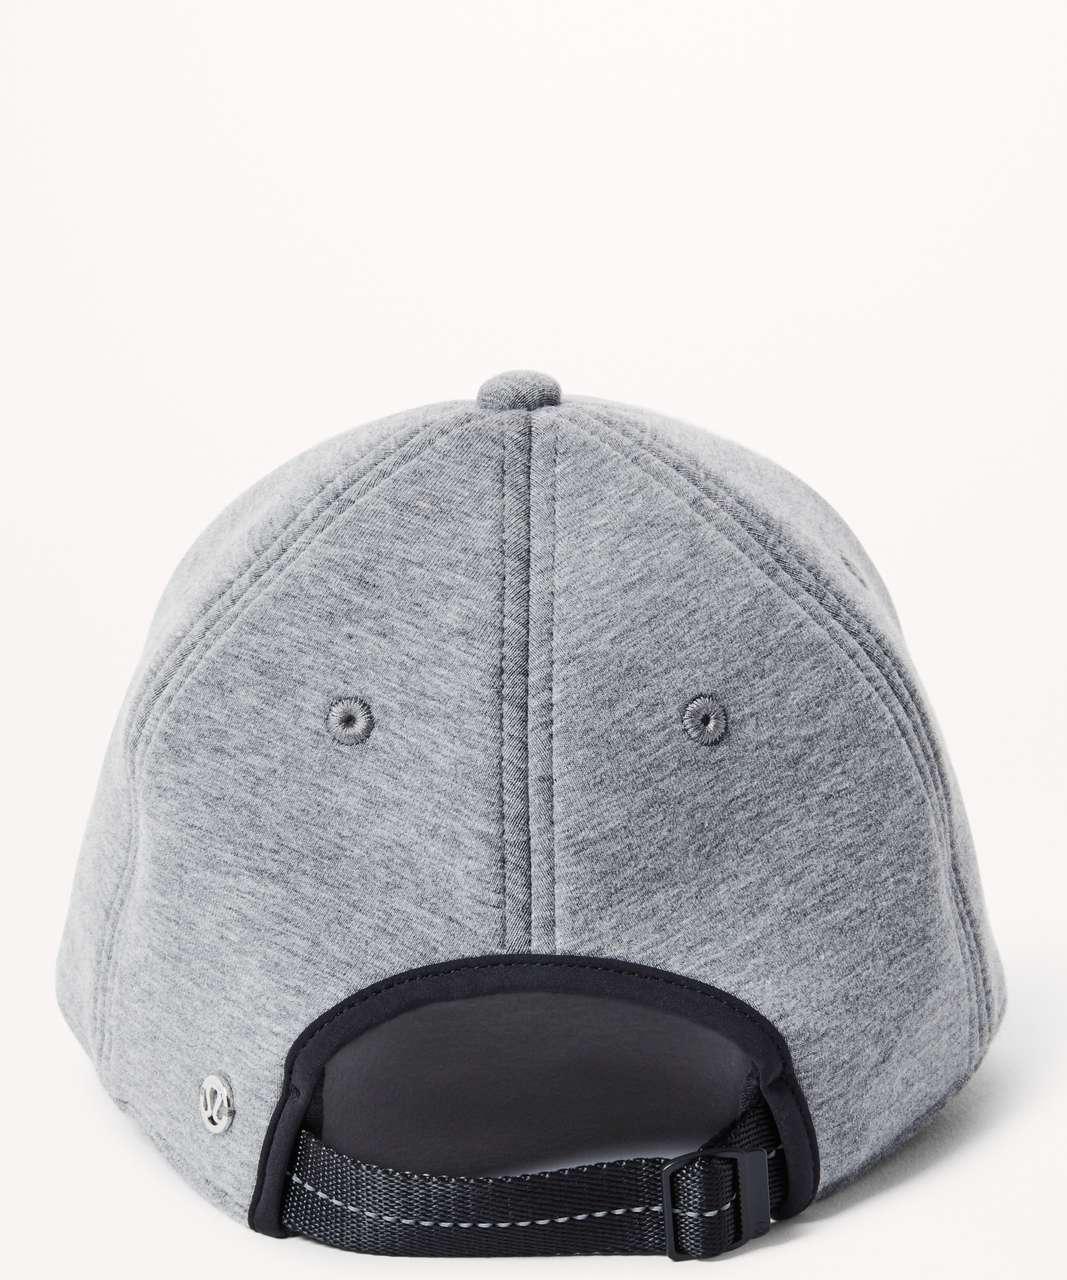 Lululemon Baller Hat - Heathered Core Medium Grey